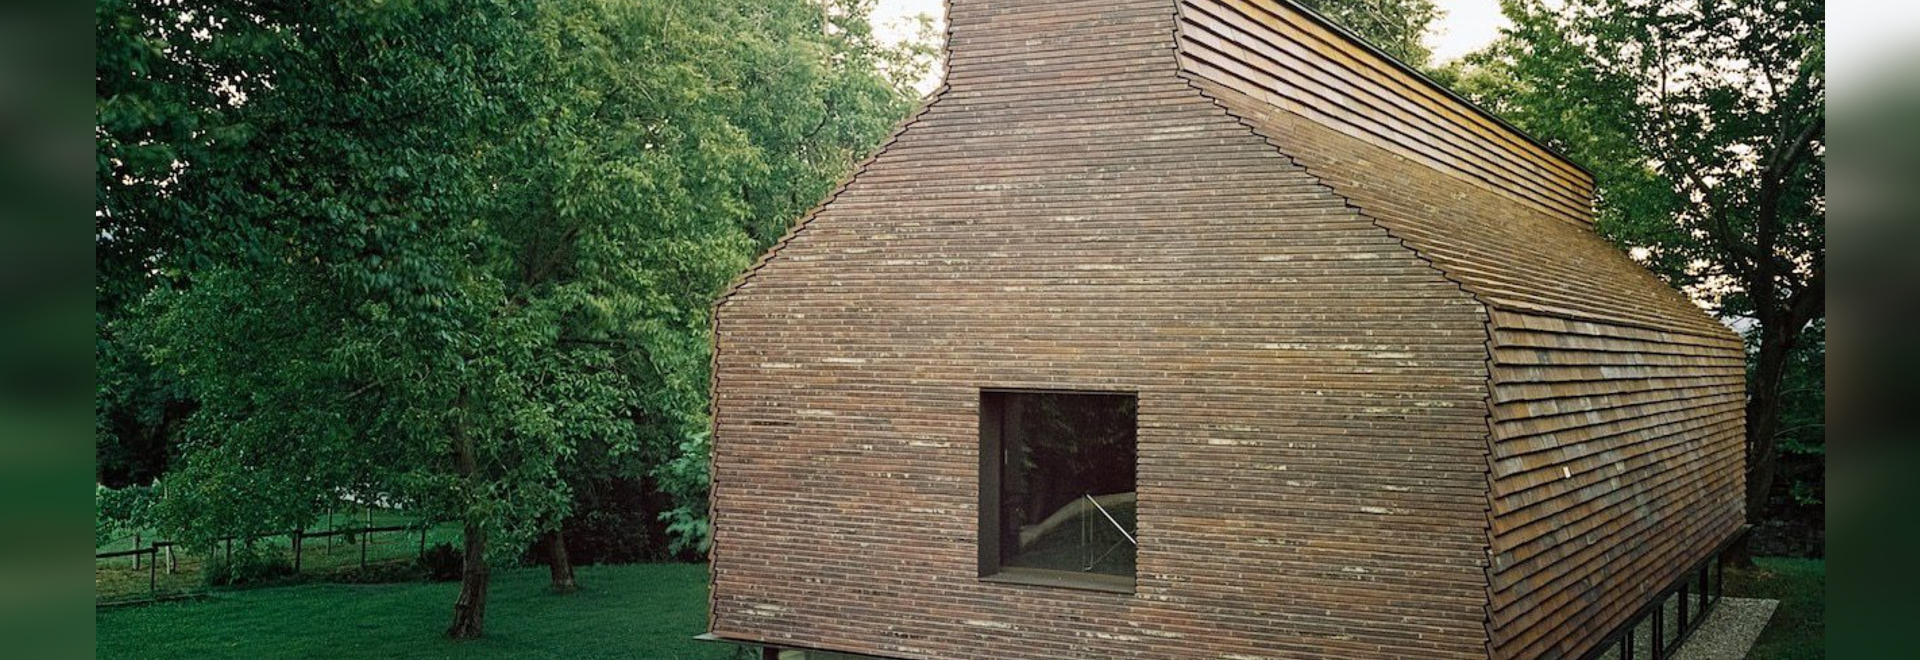 A Swiss atelier covered in clinker bricks